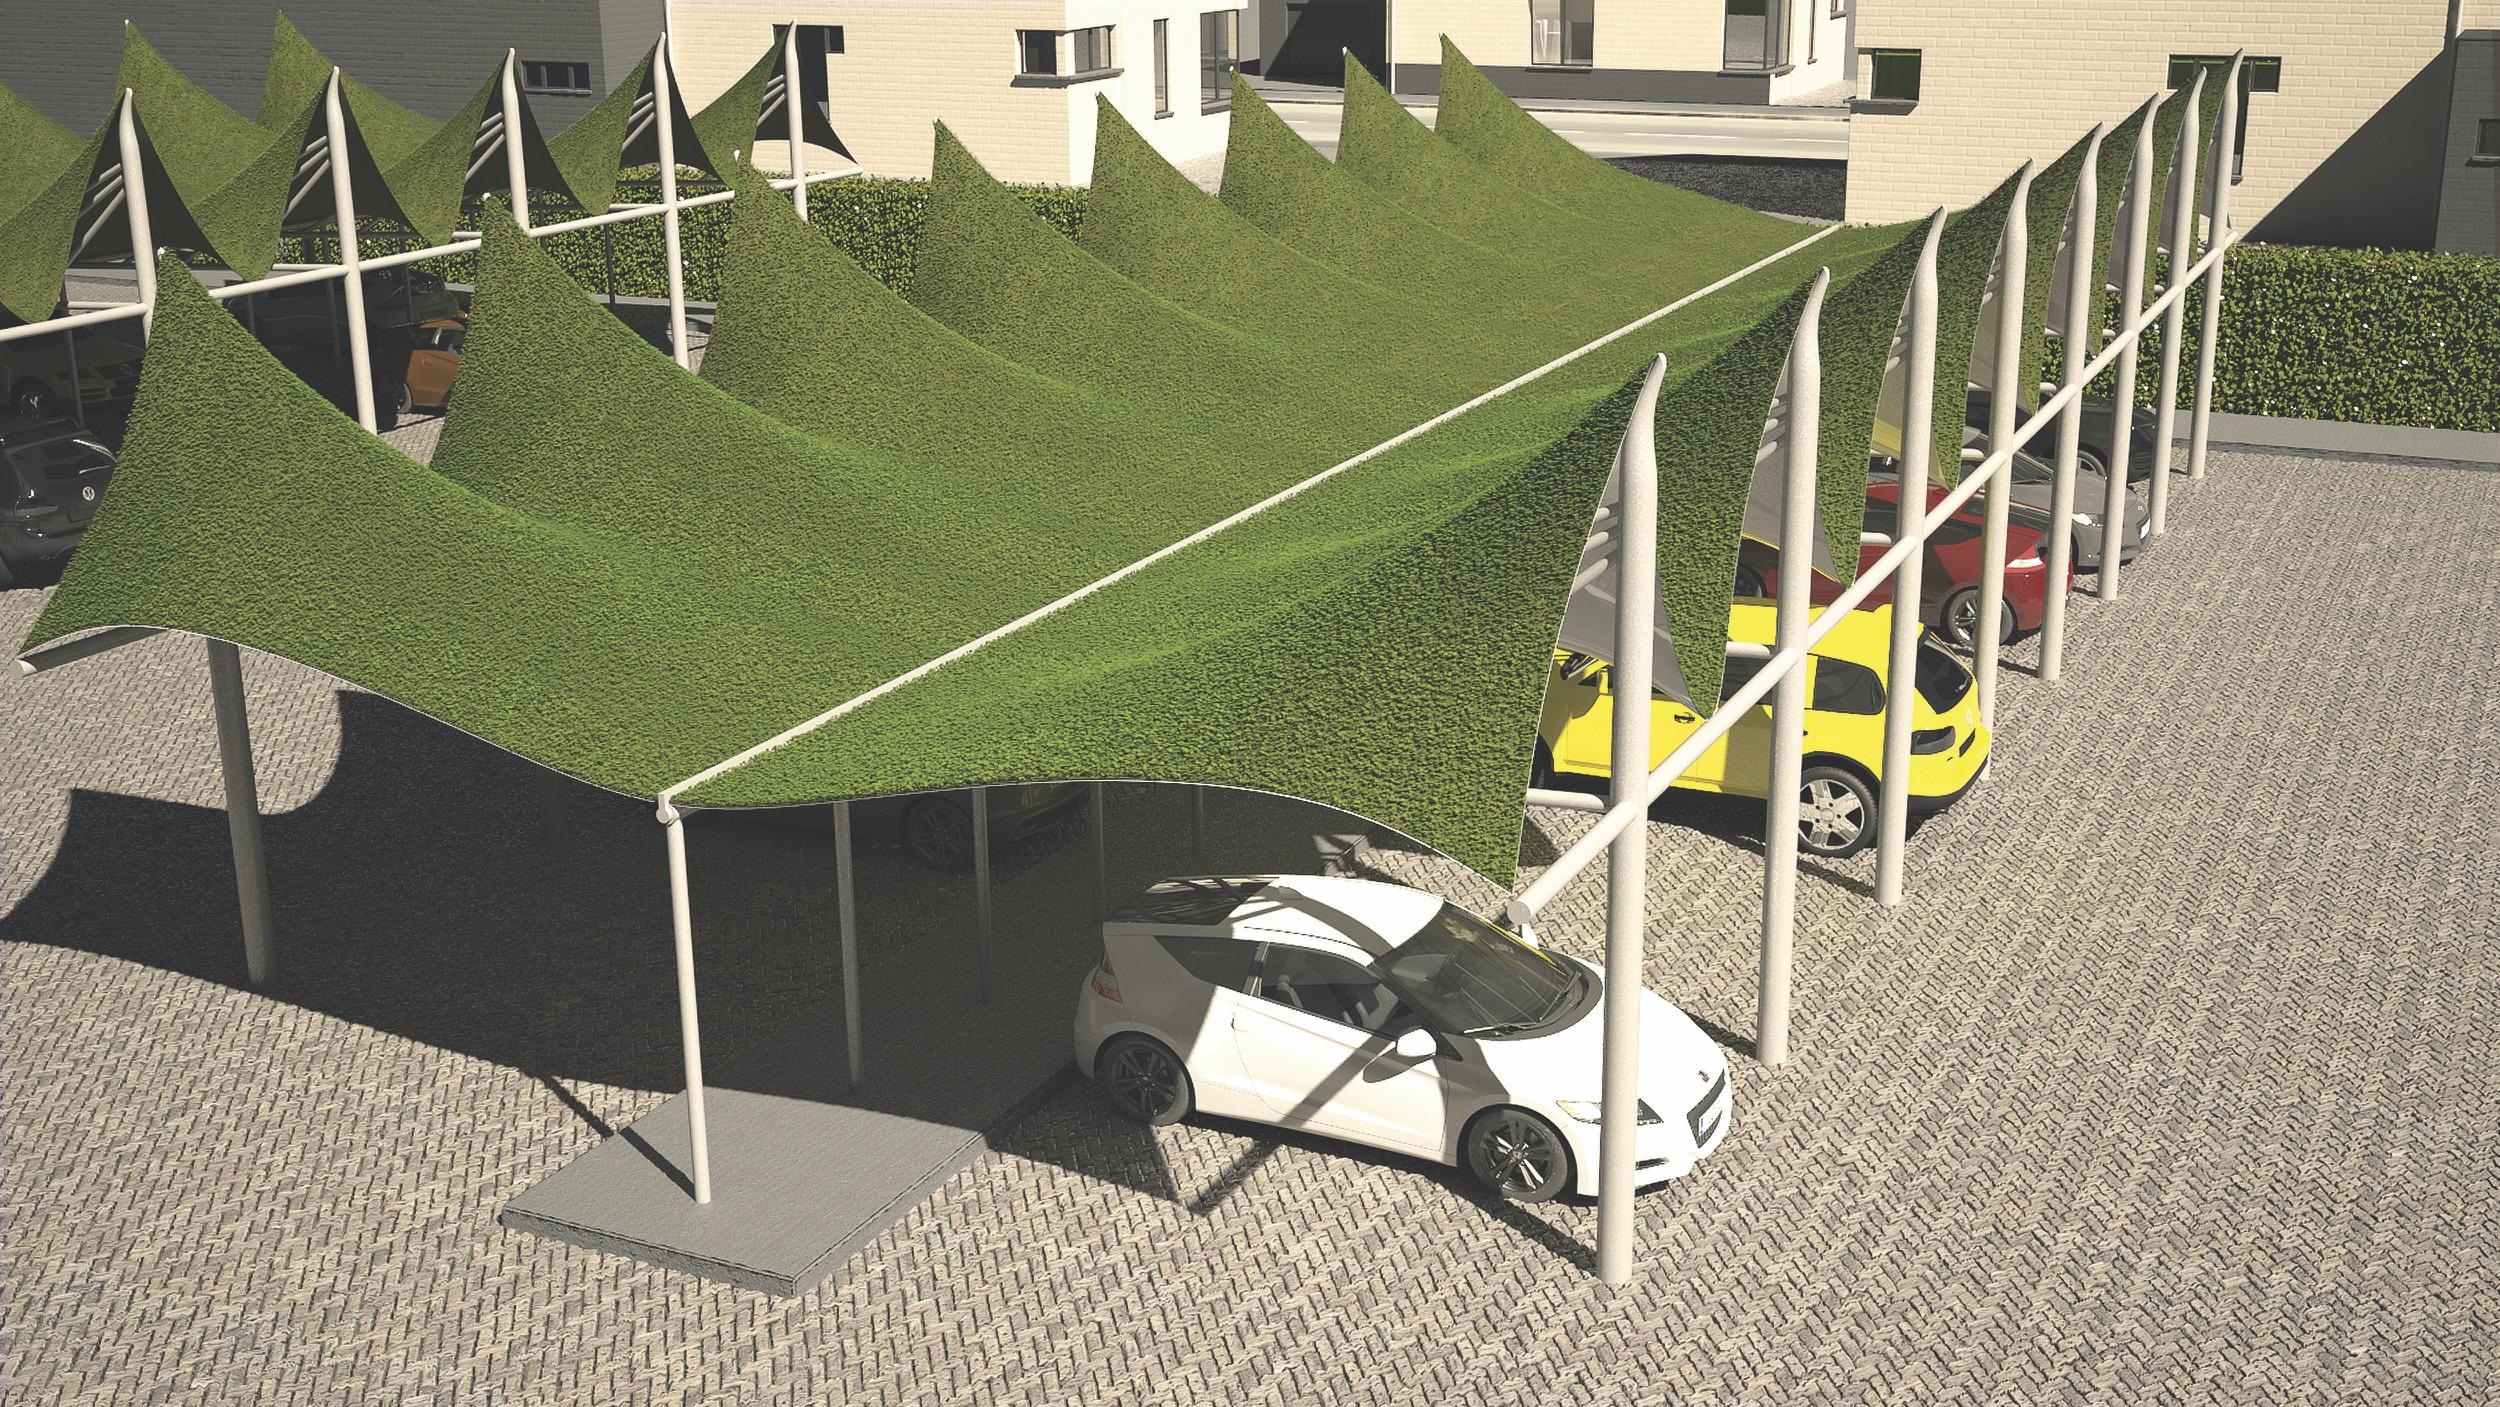 09-parking_veg.jpg